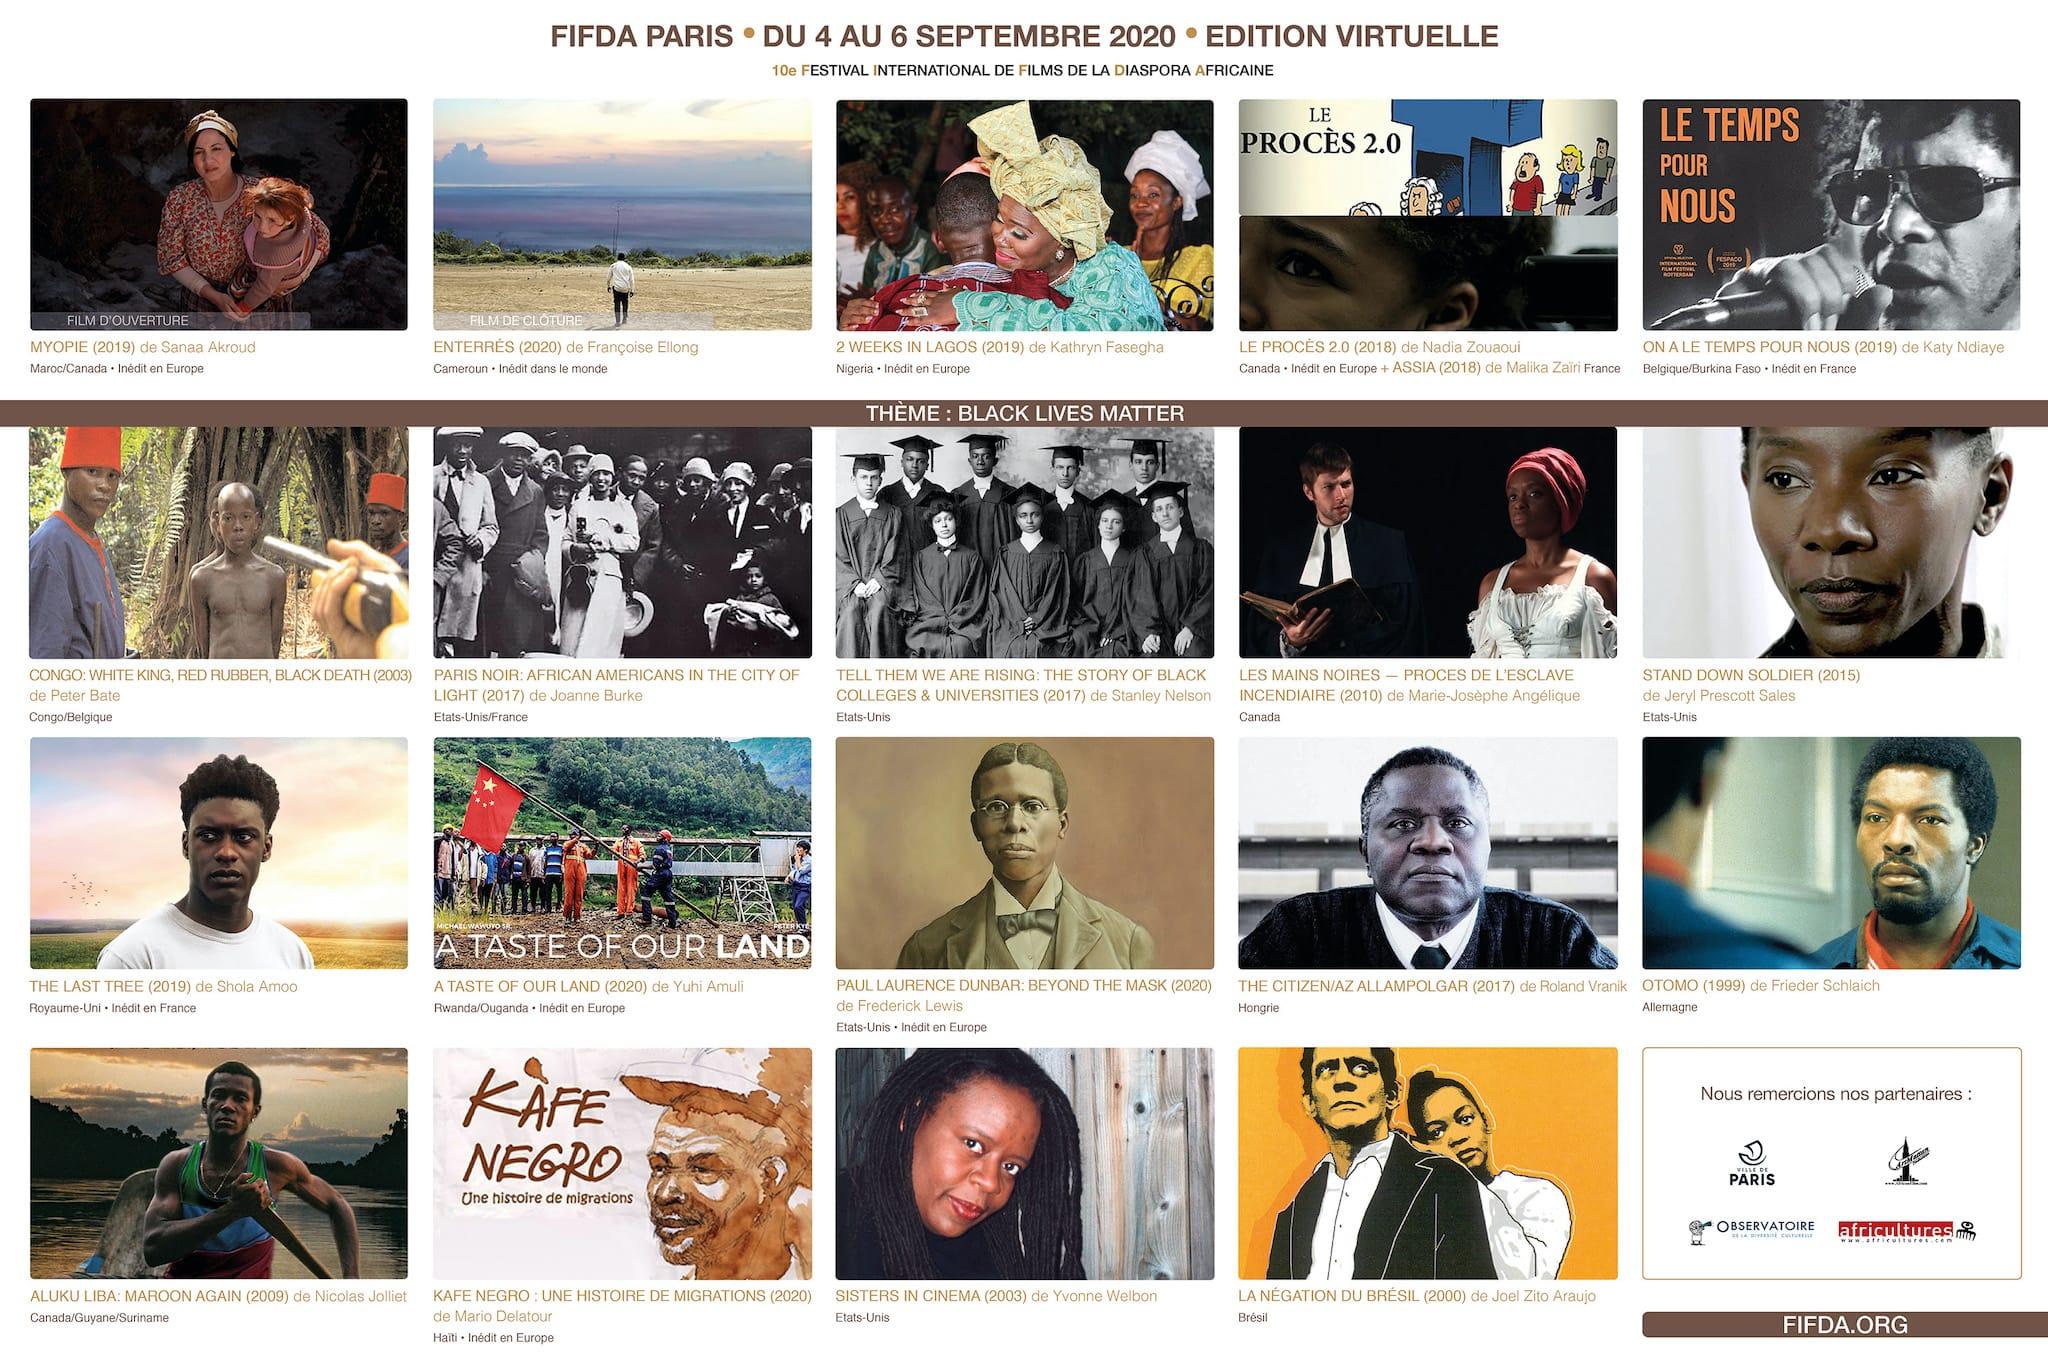 Festival International des Films de la Diaspora Africaine (FIFDA) 2020 grille de porgrammation cinéma